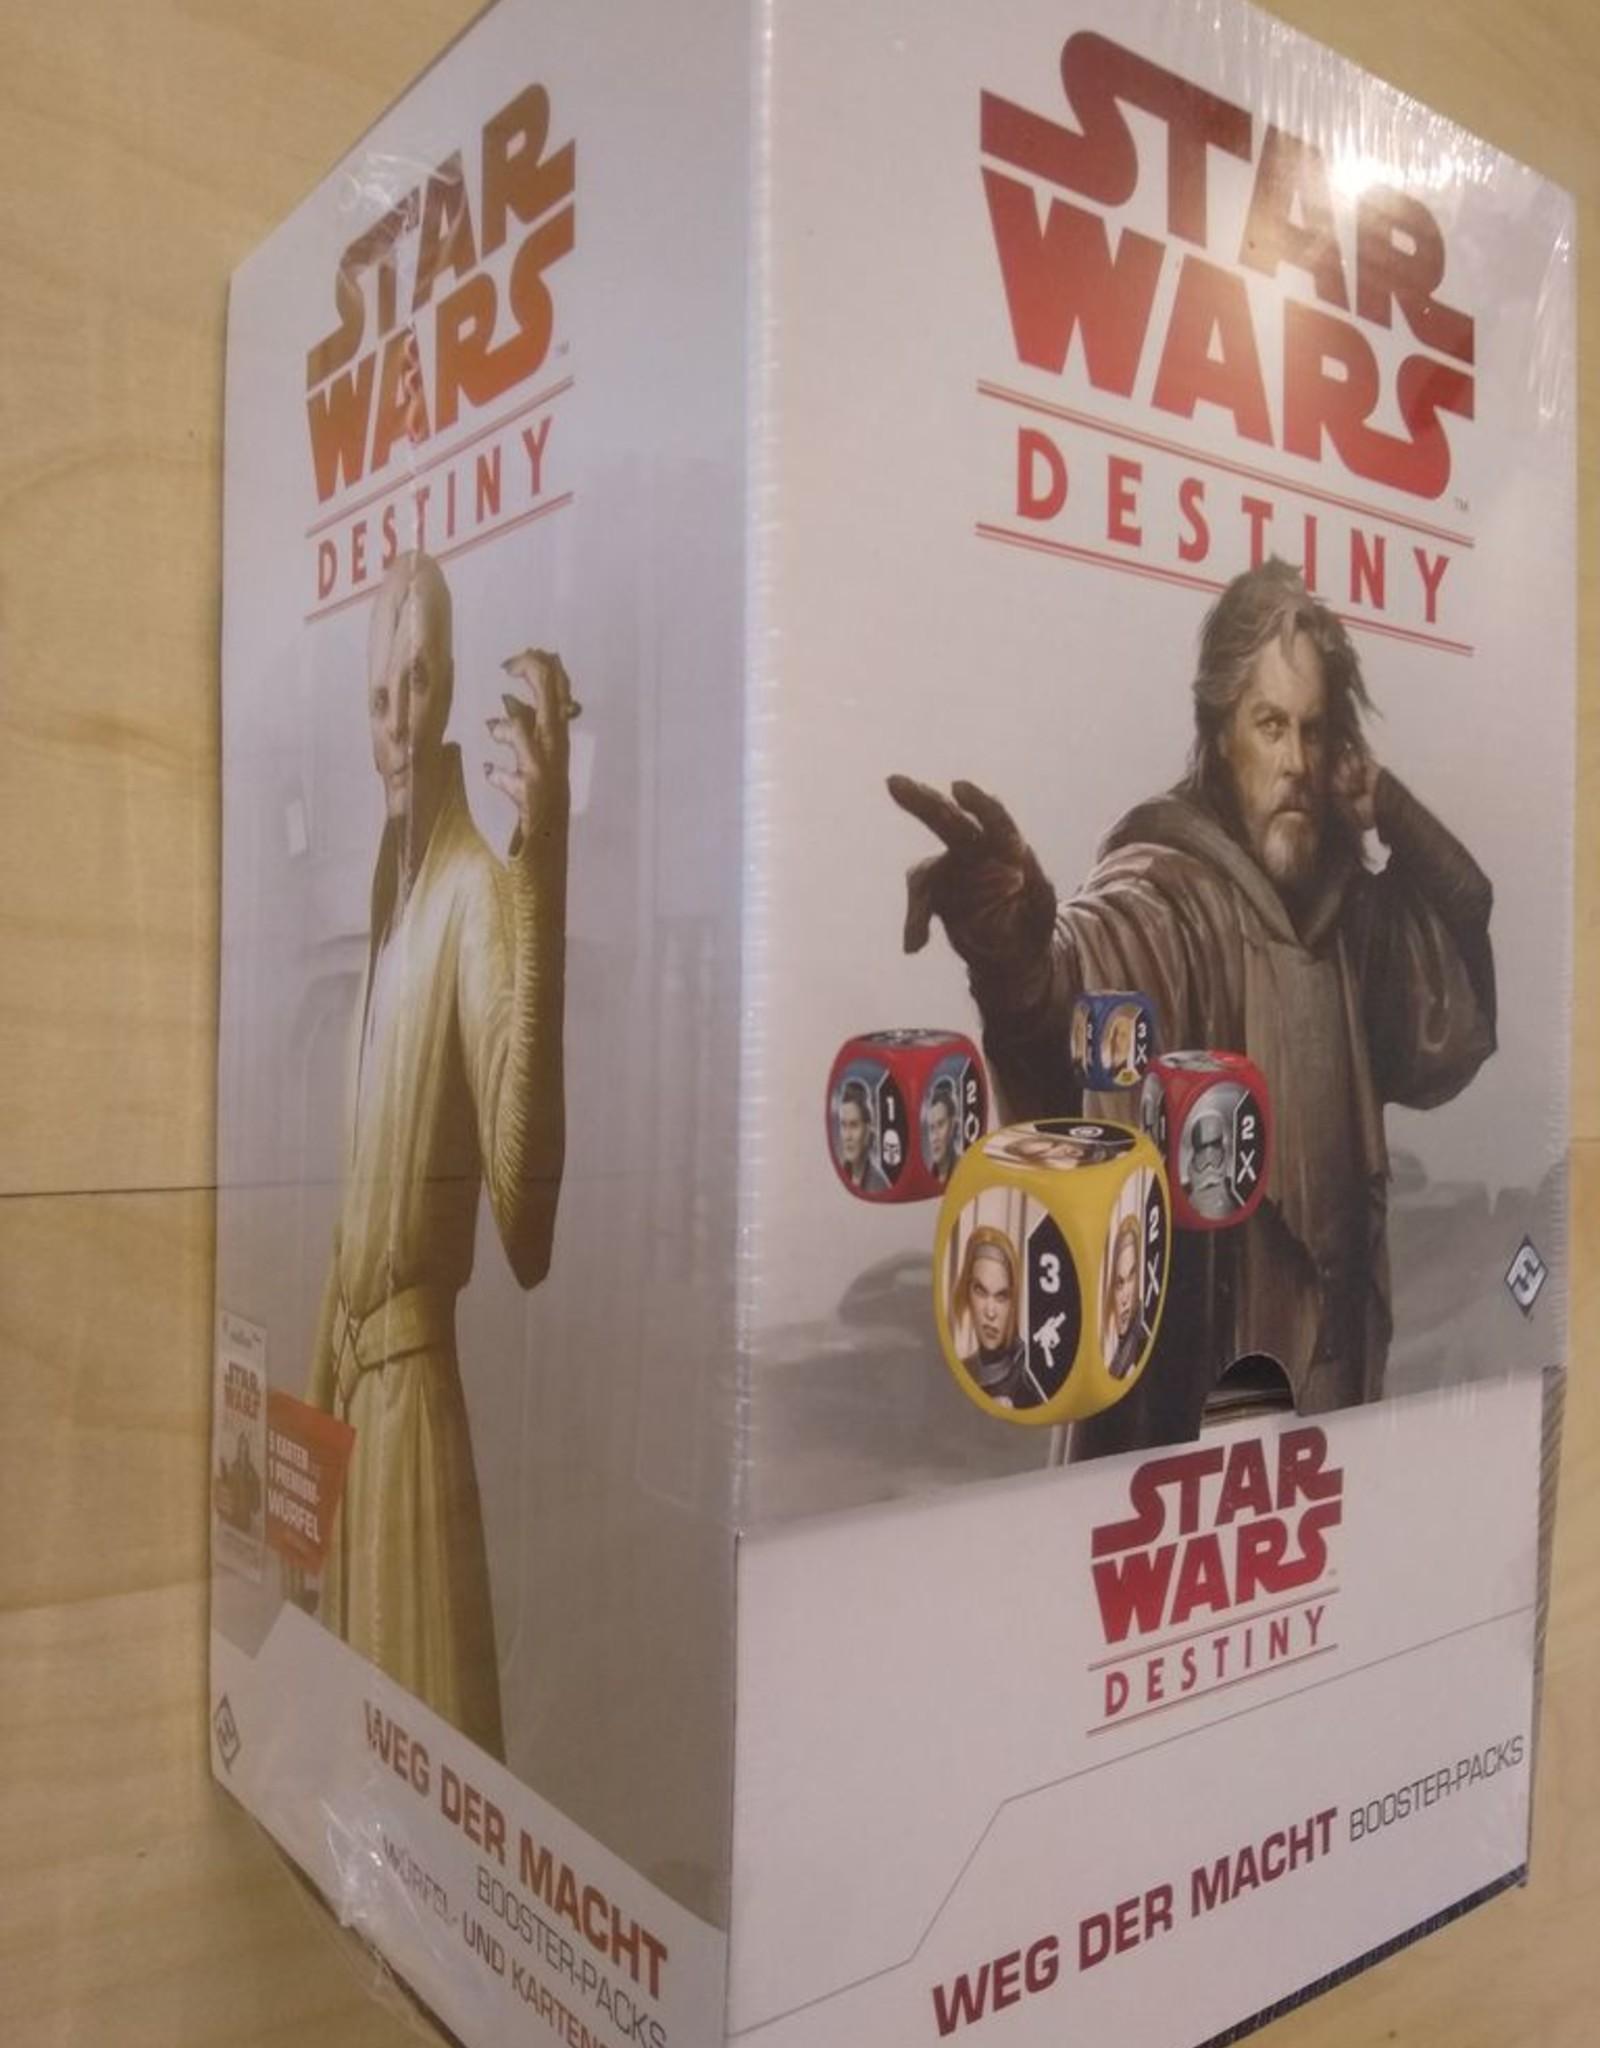 FFG - Star Wars Destiny FFG - Star Wars: Destiny - Weg der Macht Booster Display (36 Boosters) - DE